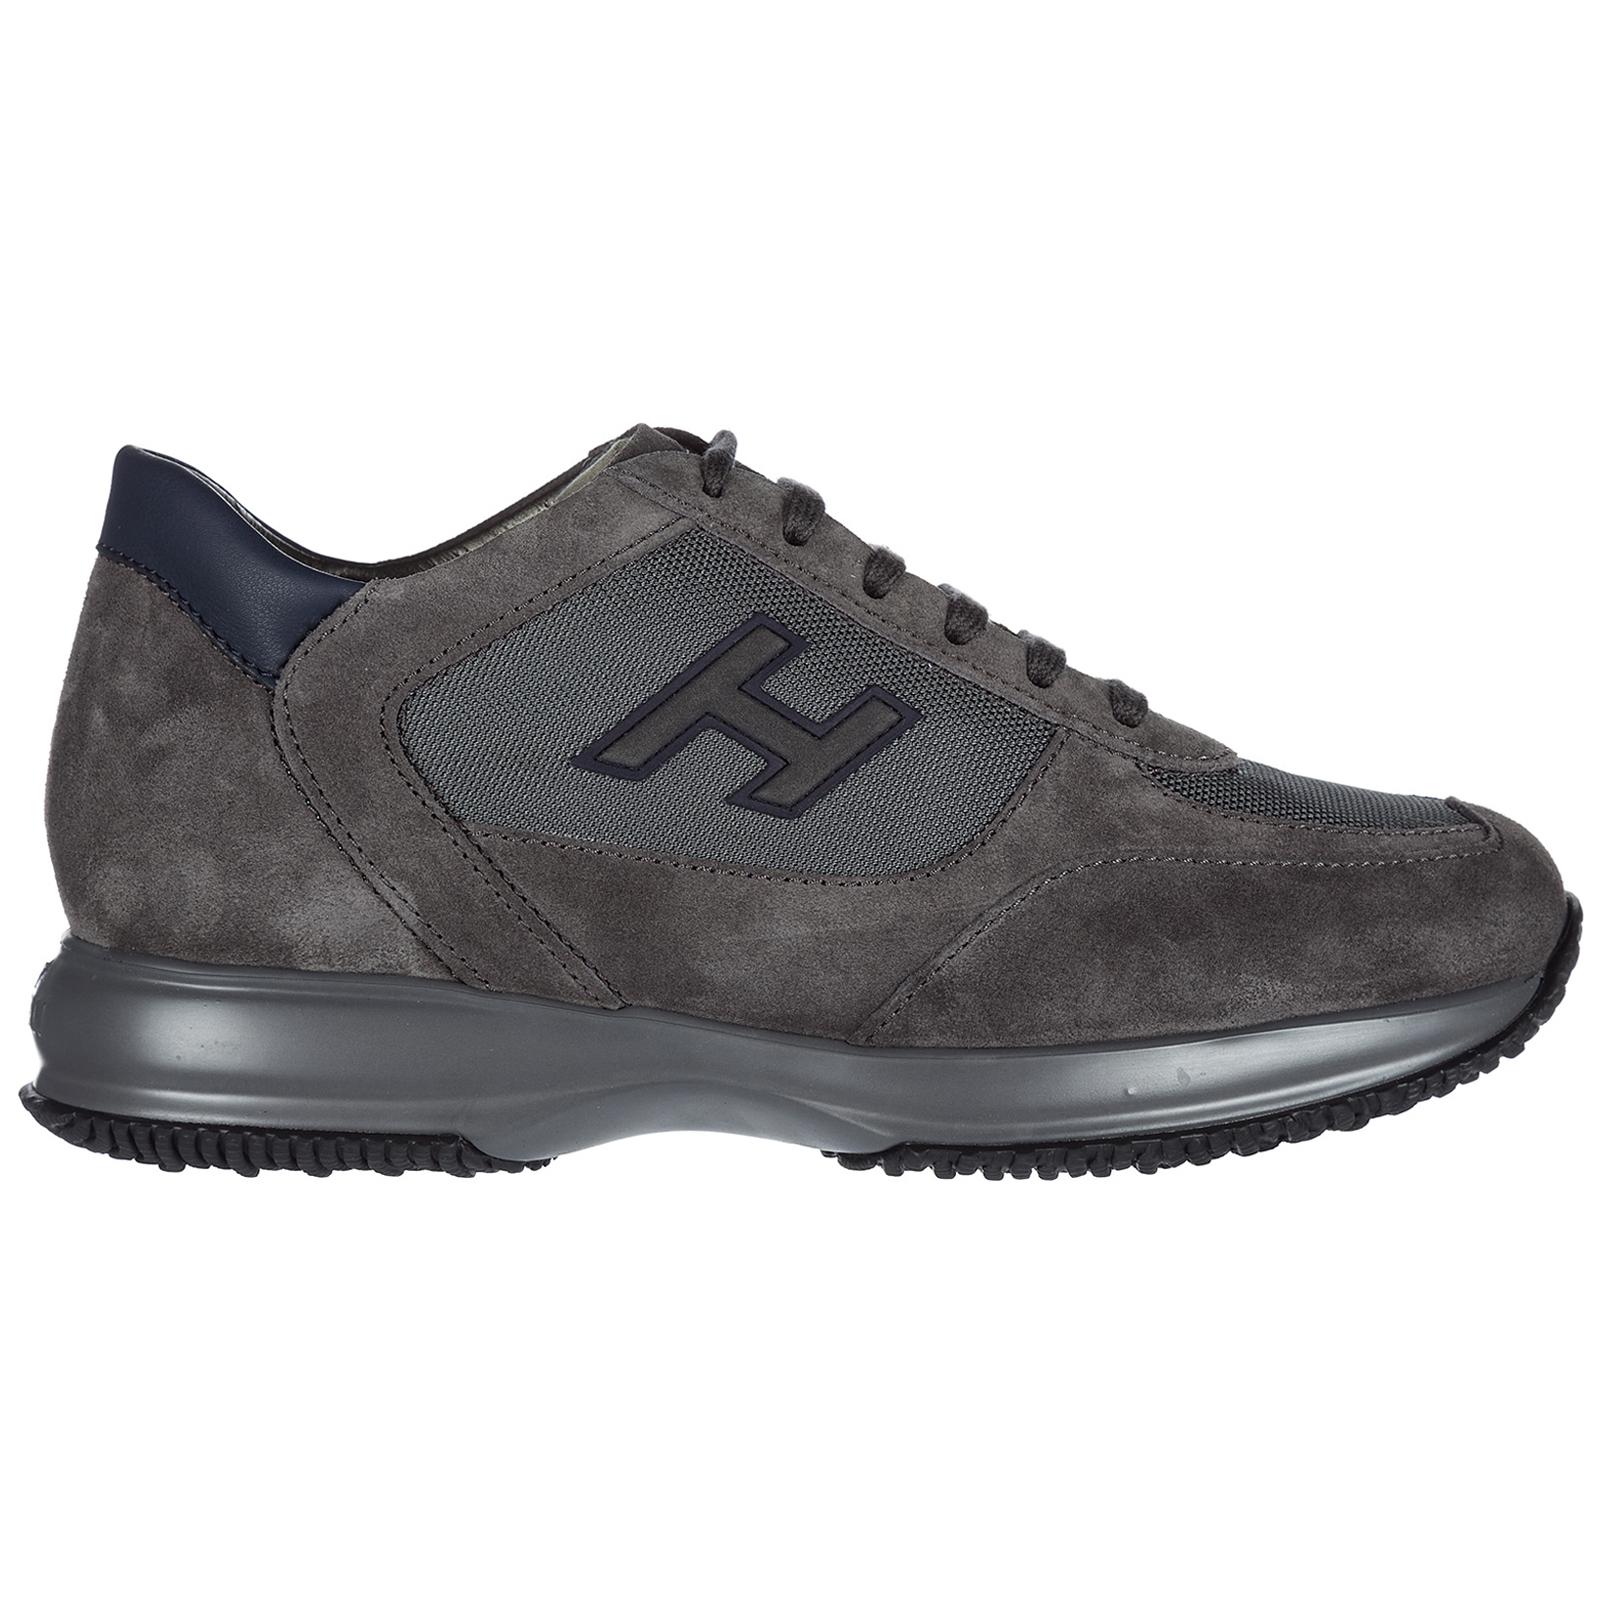 Scarpe sneakers uomo camoscio new interactive h flock ... e610c949a9e